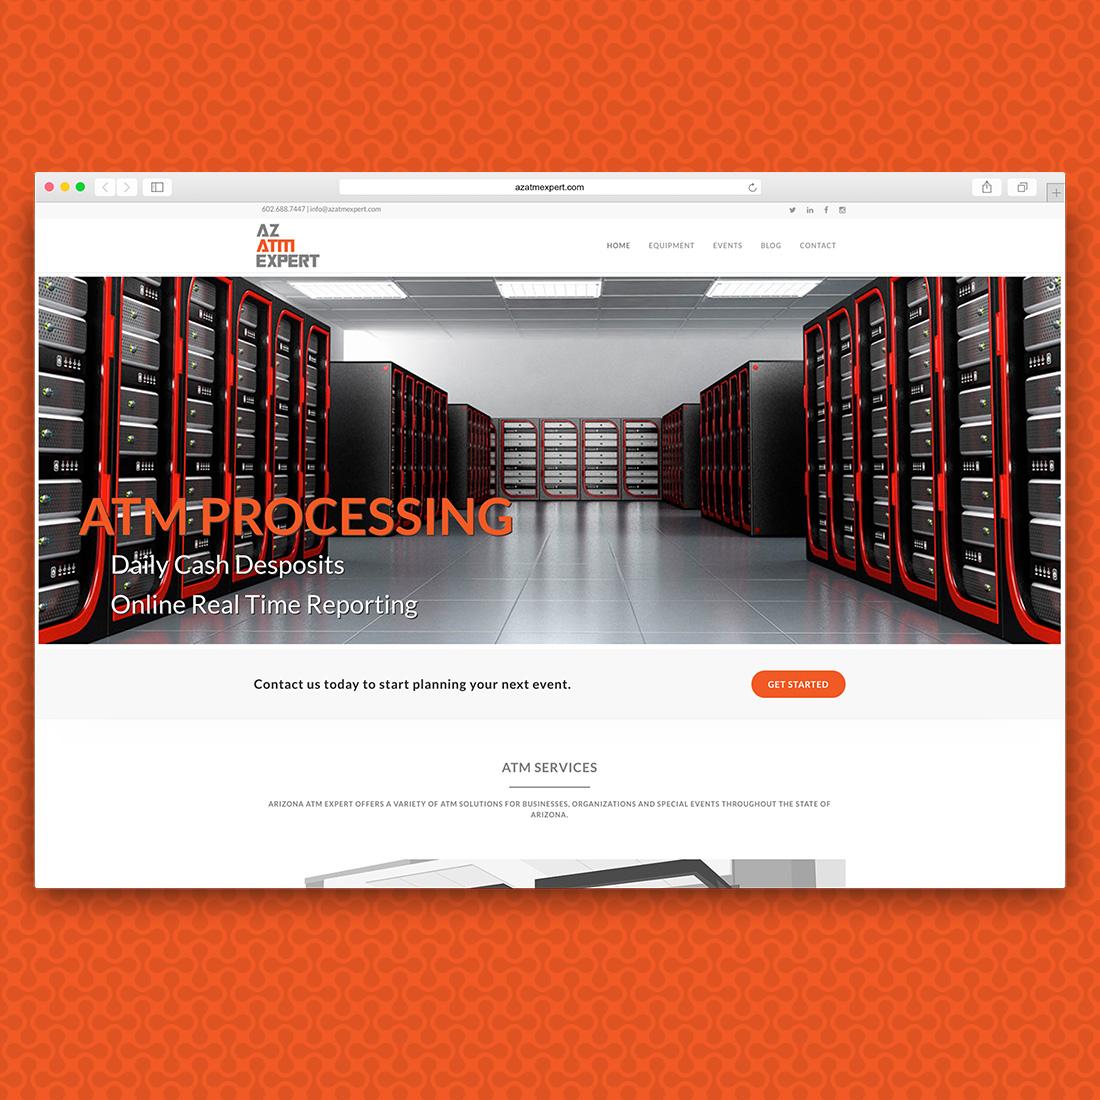 AZ ATM Experts Website Home Page